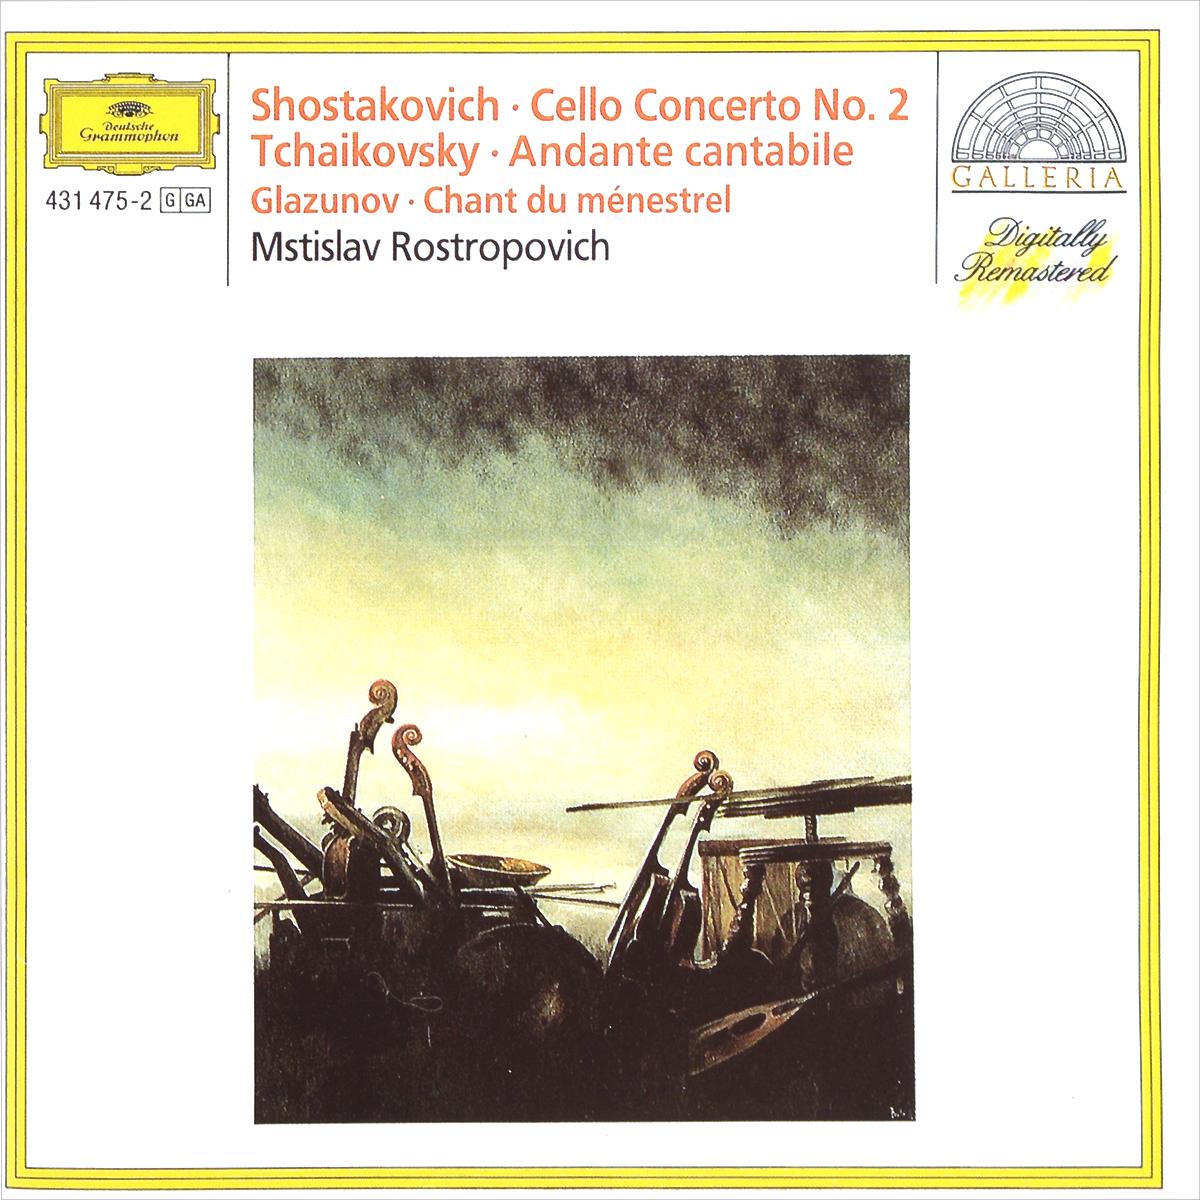 цена на Мстислав Ростропович Mstislav Rostropovich. Shostakovich. Cello Concerto No. 2 / Tchaikovsky. Andante Cantabile / Glazunov. Chant Du Menestrel